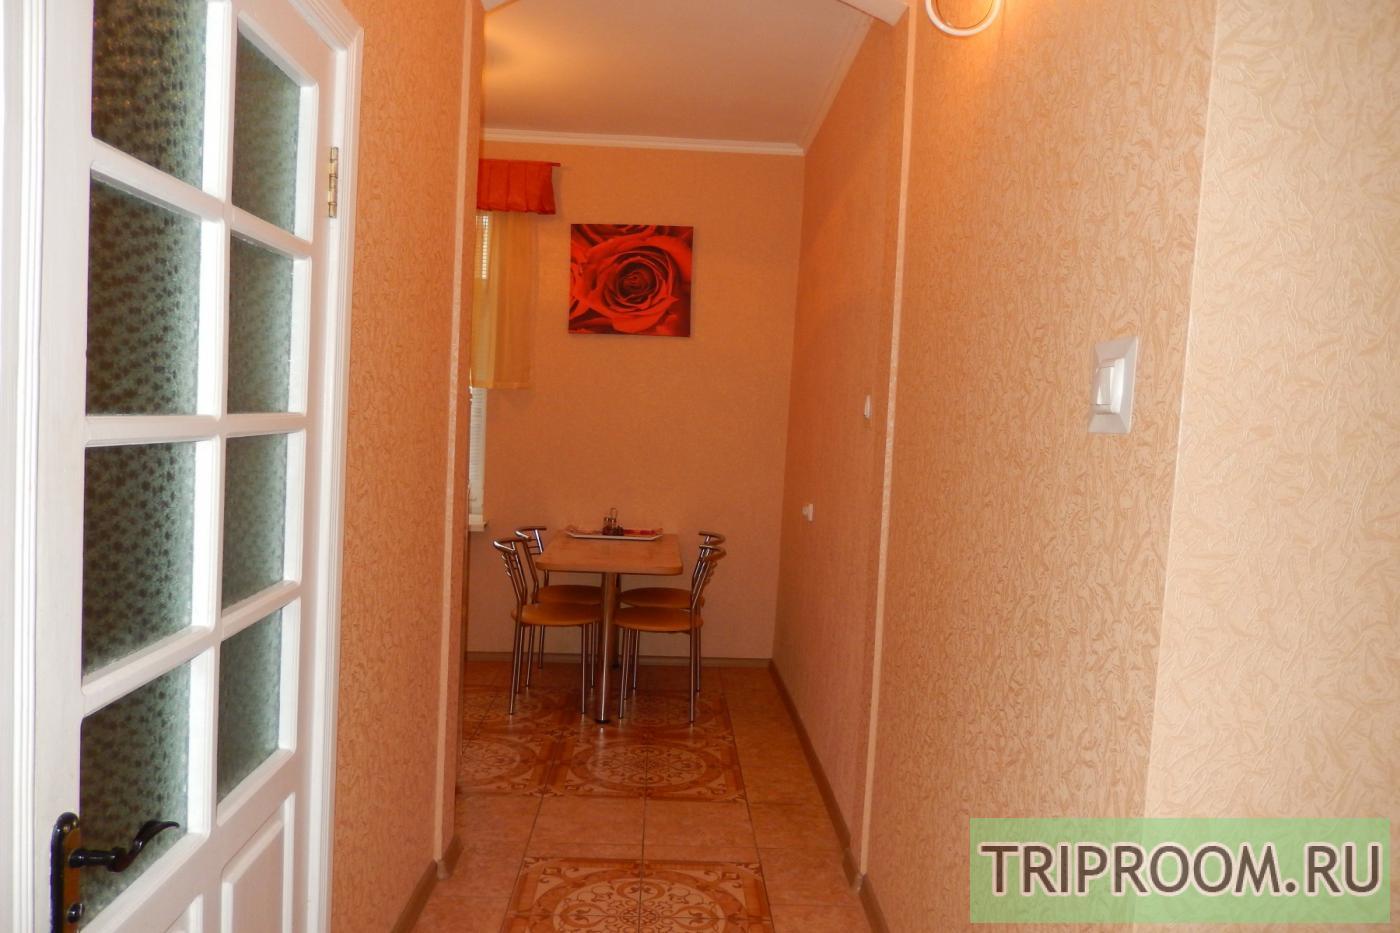 2-комнатная квартира посуточно (вариант № 21949), ул. Очаковцев улица, фото № 6